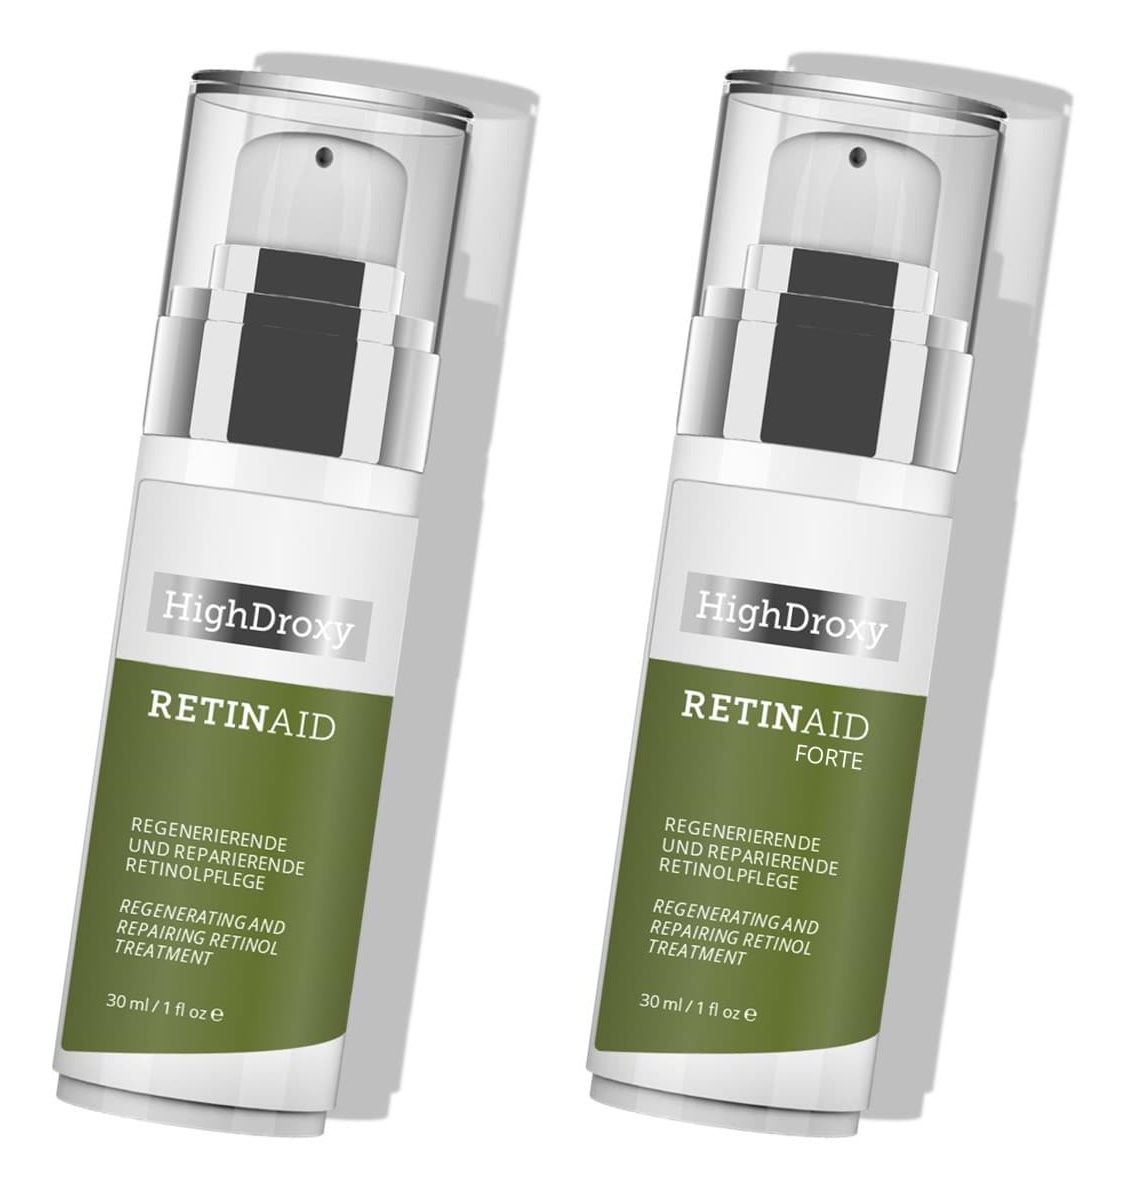 0.1% | Retinaid Forte